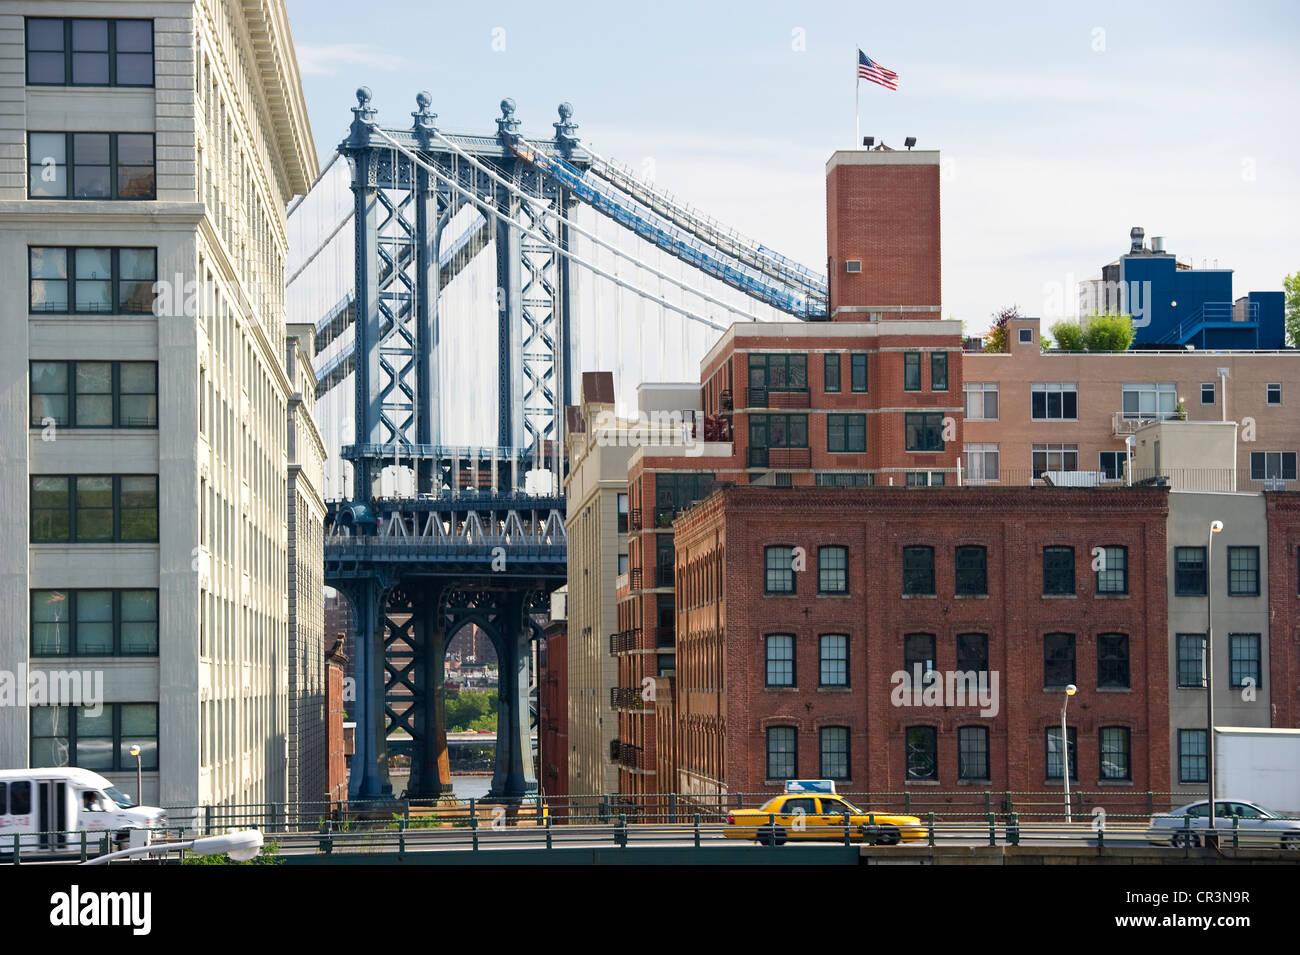 Manhattan Bridge, Brooklyn Heights, New York, USA - Stock Image